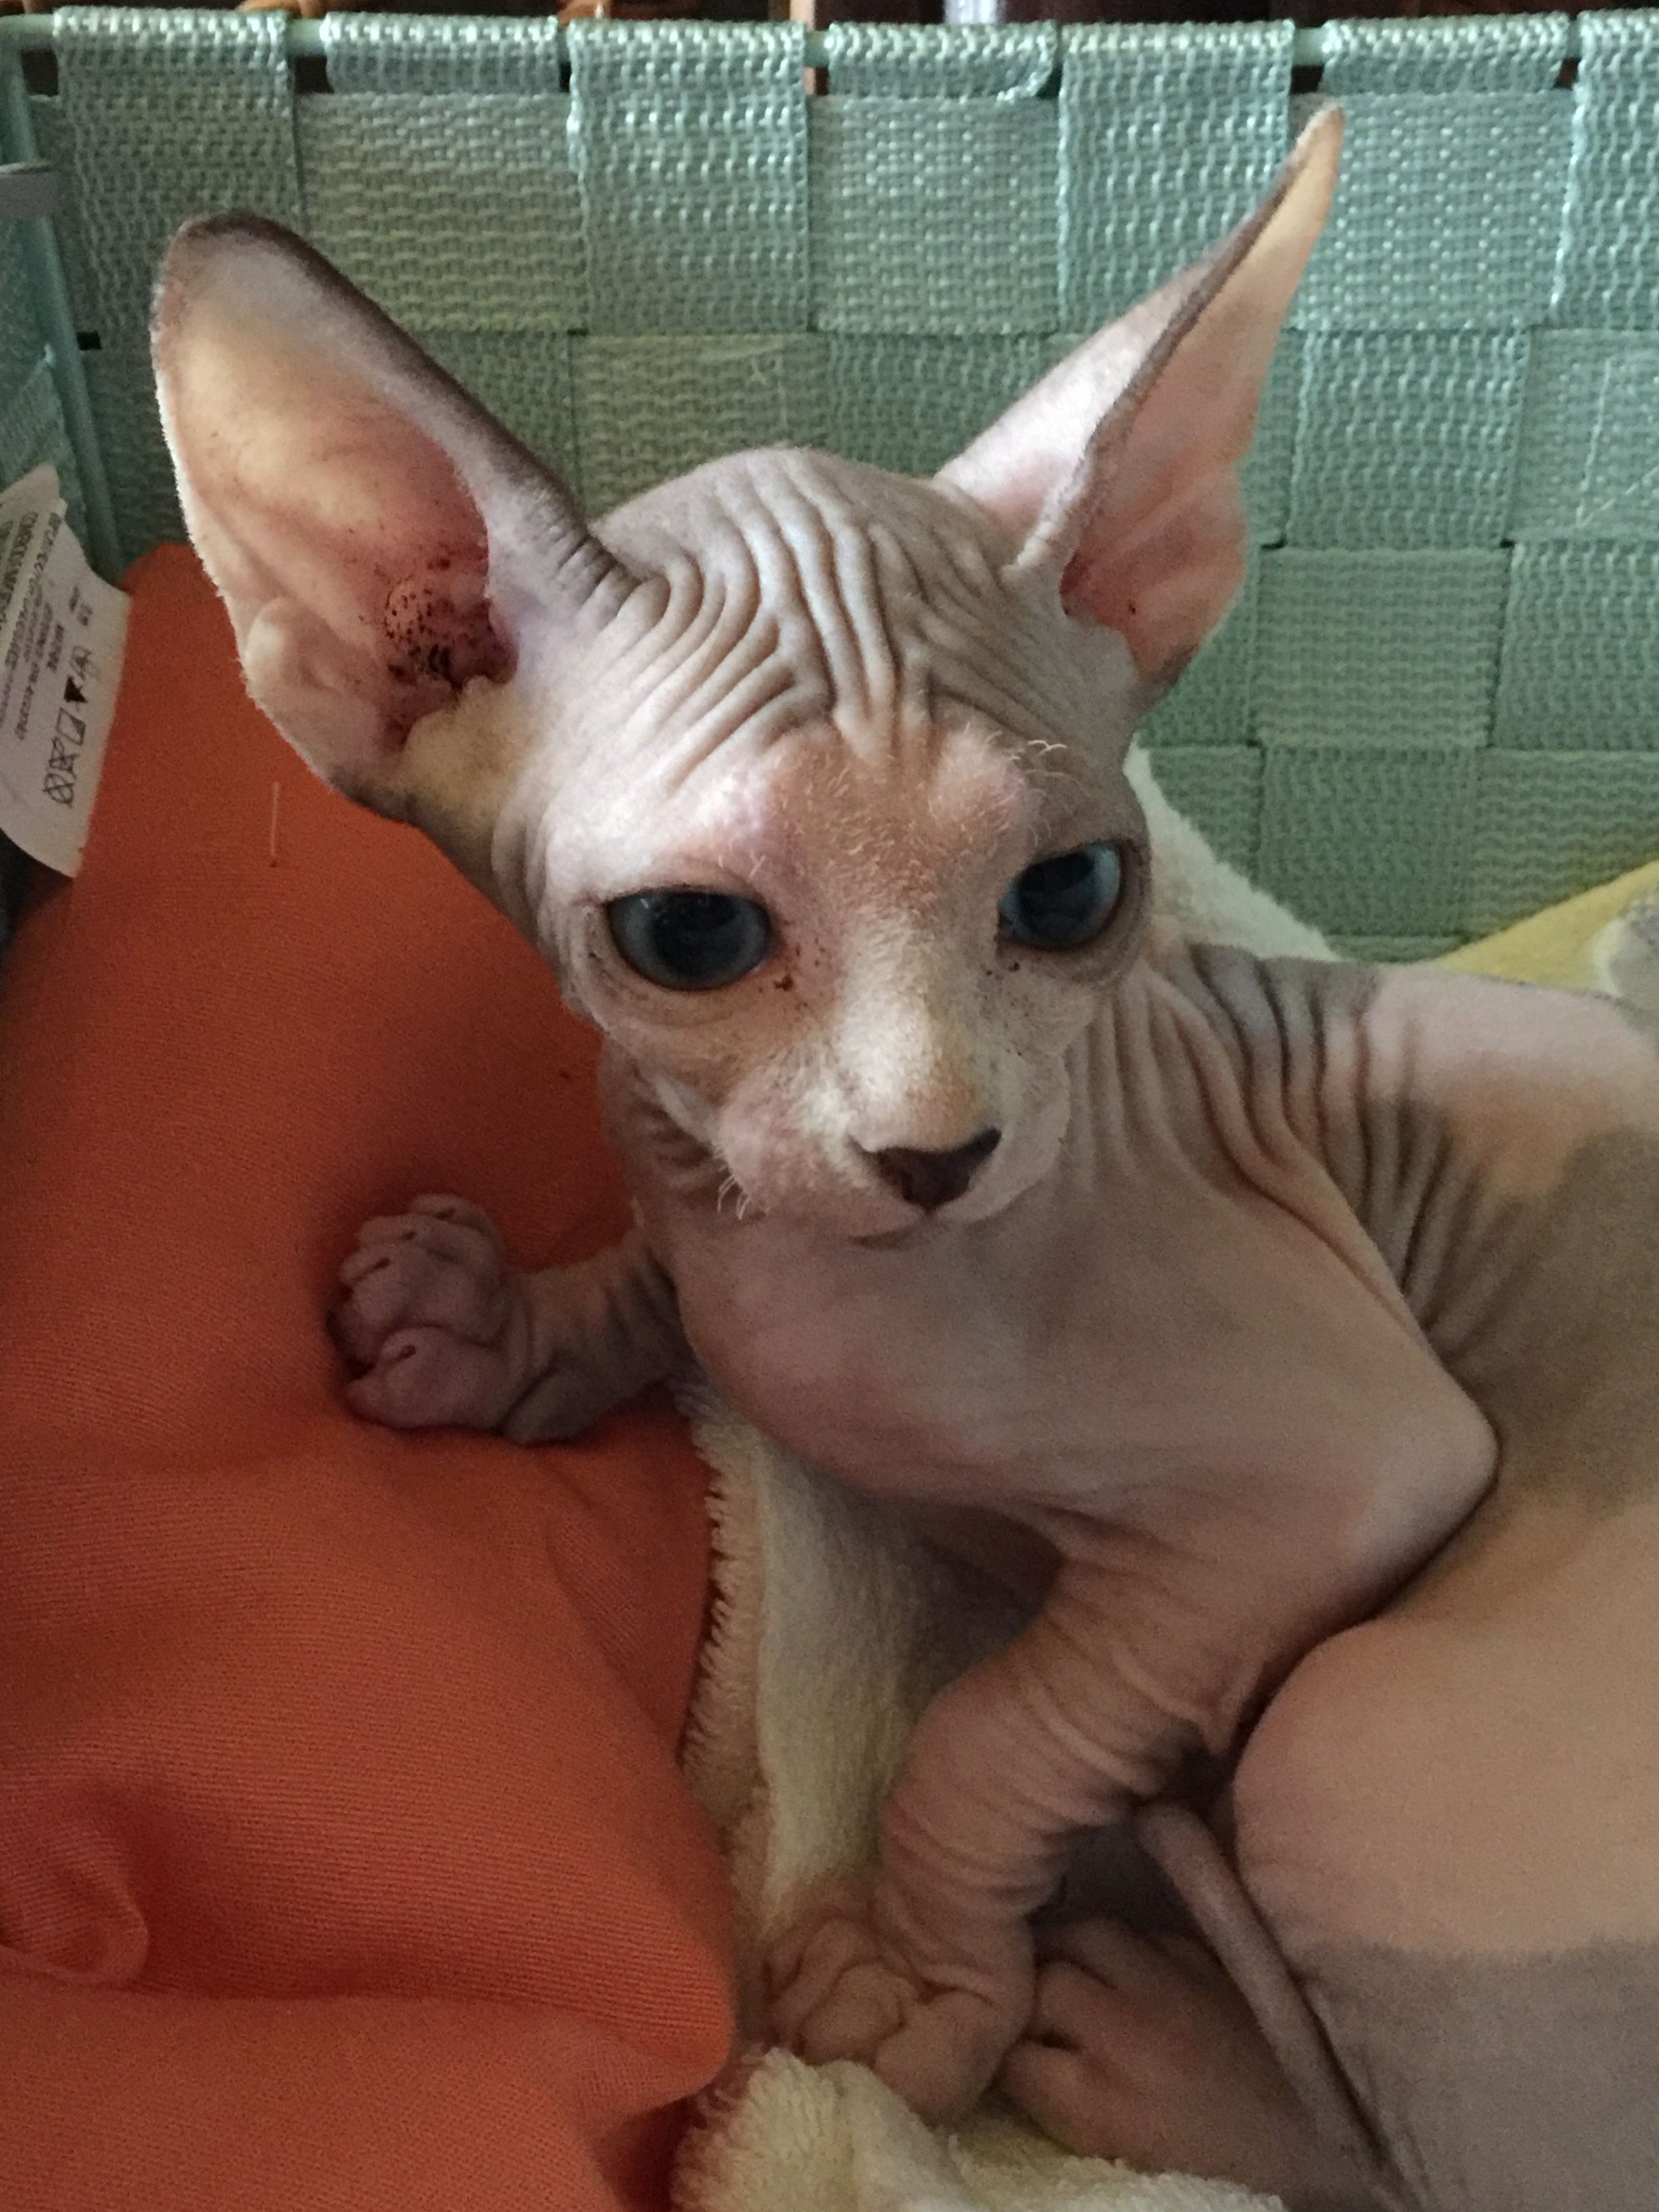 Pin By Nanda On Sphynx Cat Hairless Cat Cute Cats Sphynx Cat